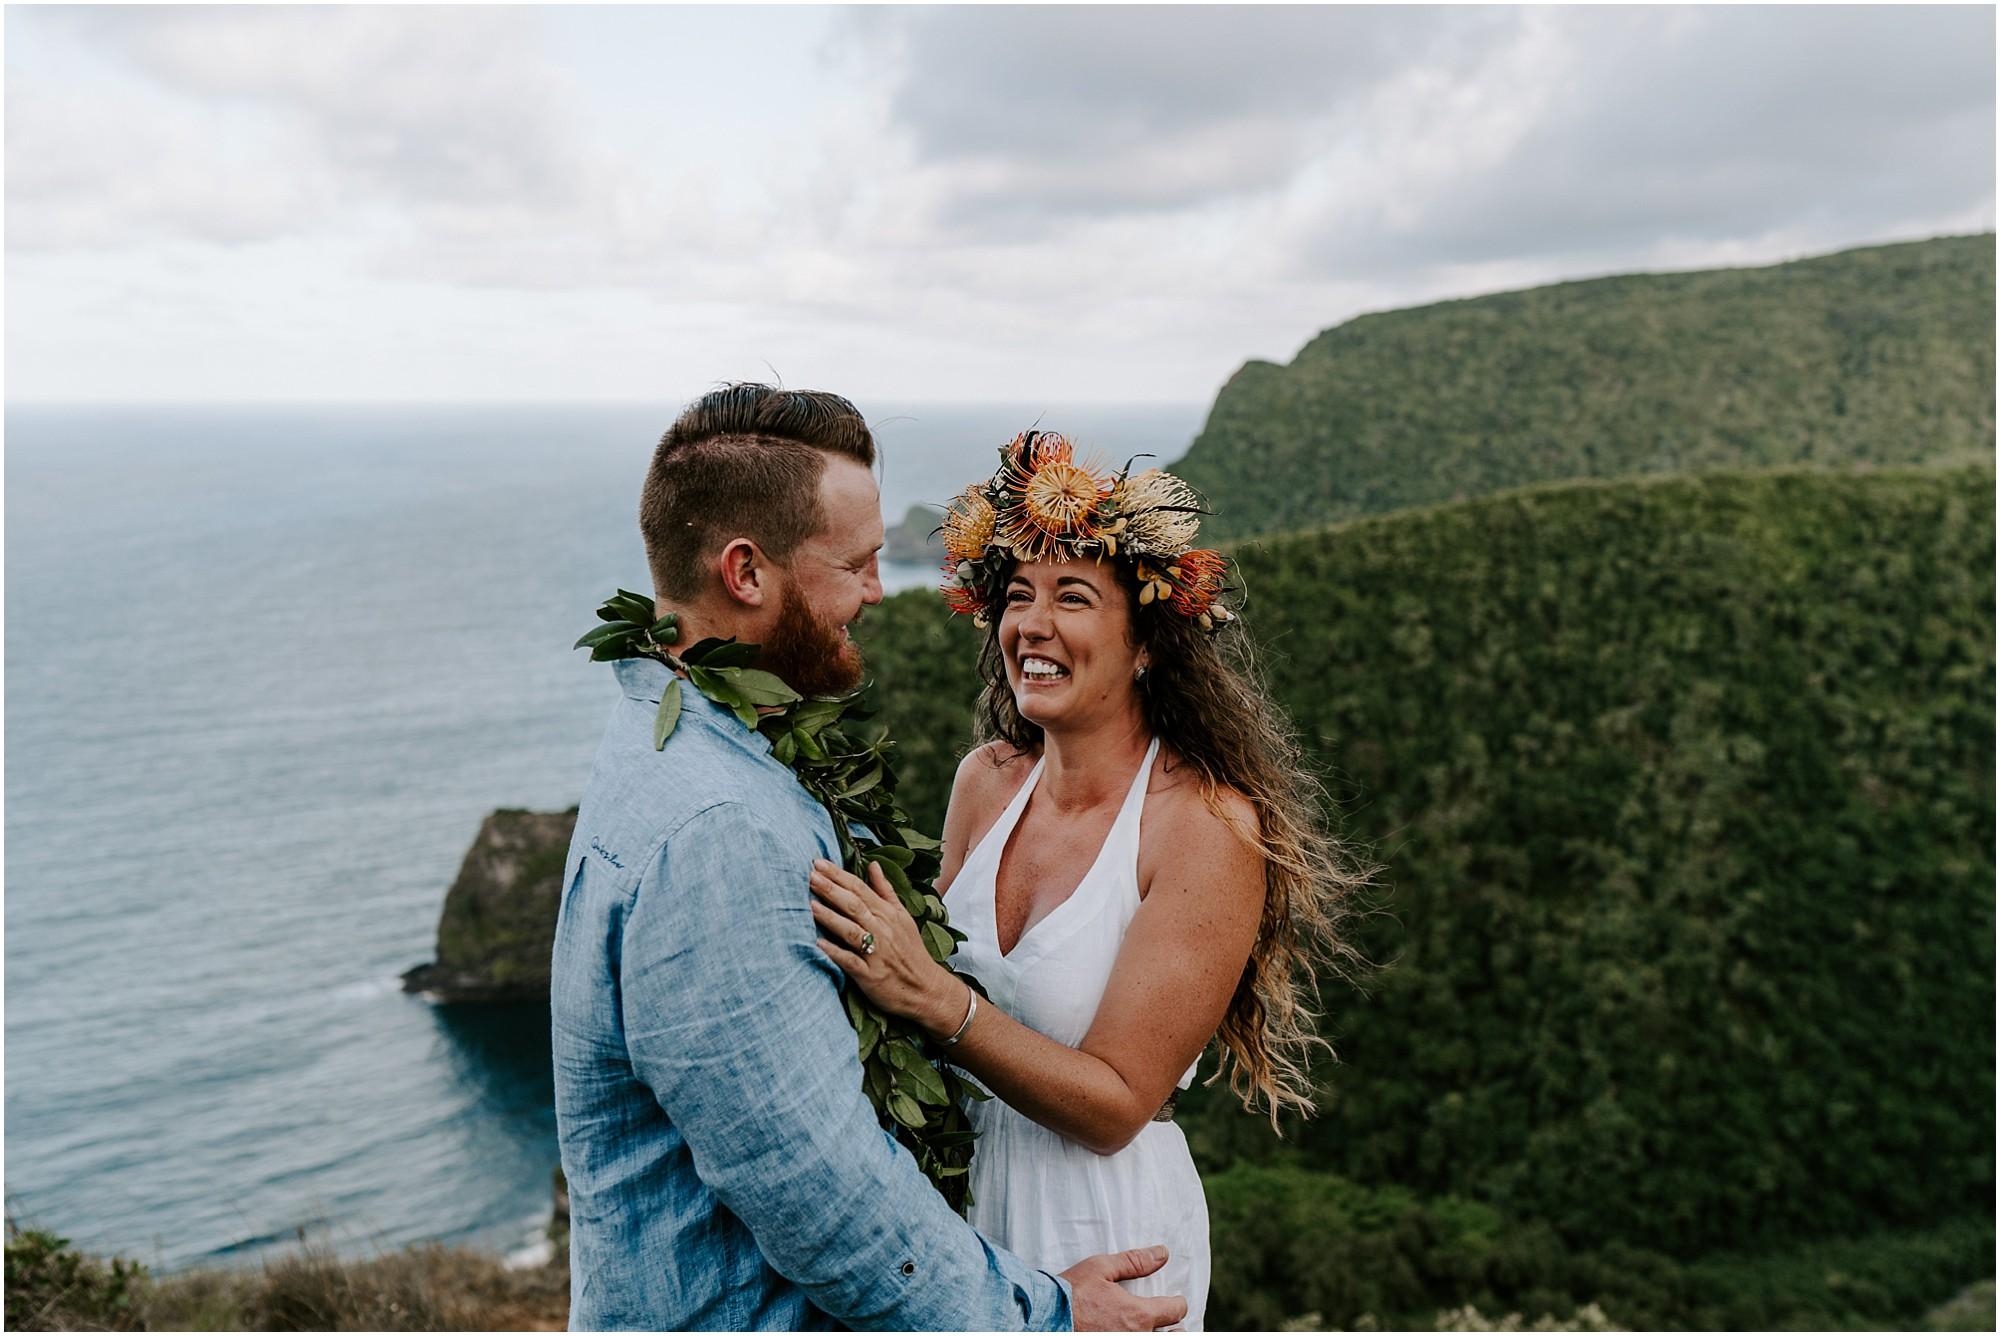 big-island-valley-proposal-hawaii-elopement-photographer_0031.jpg